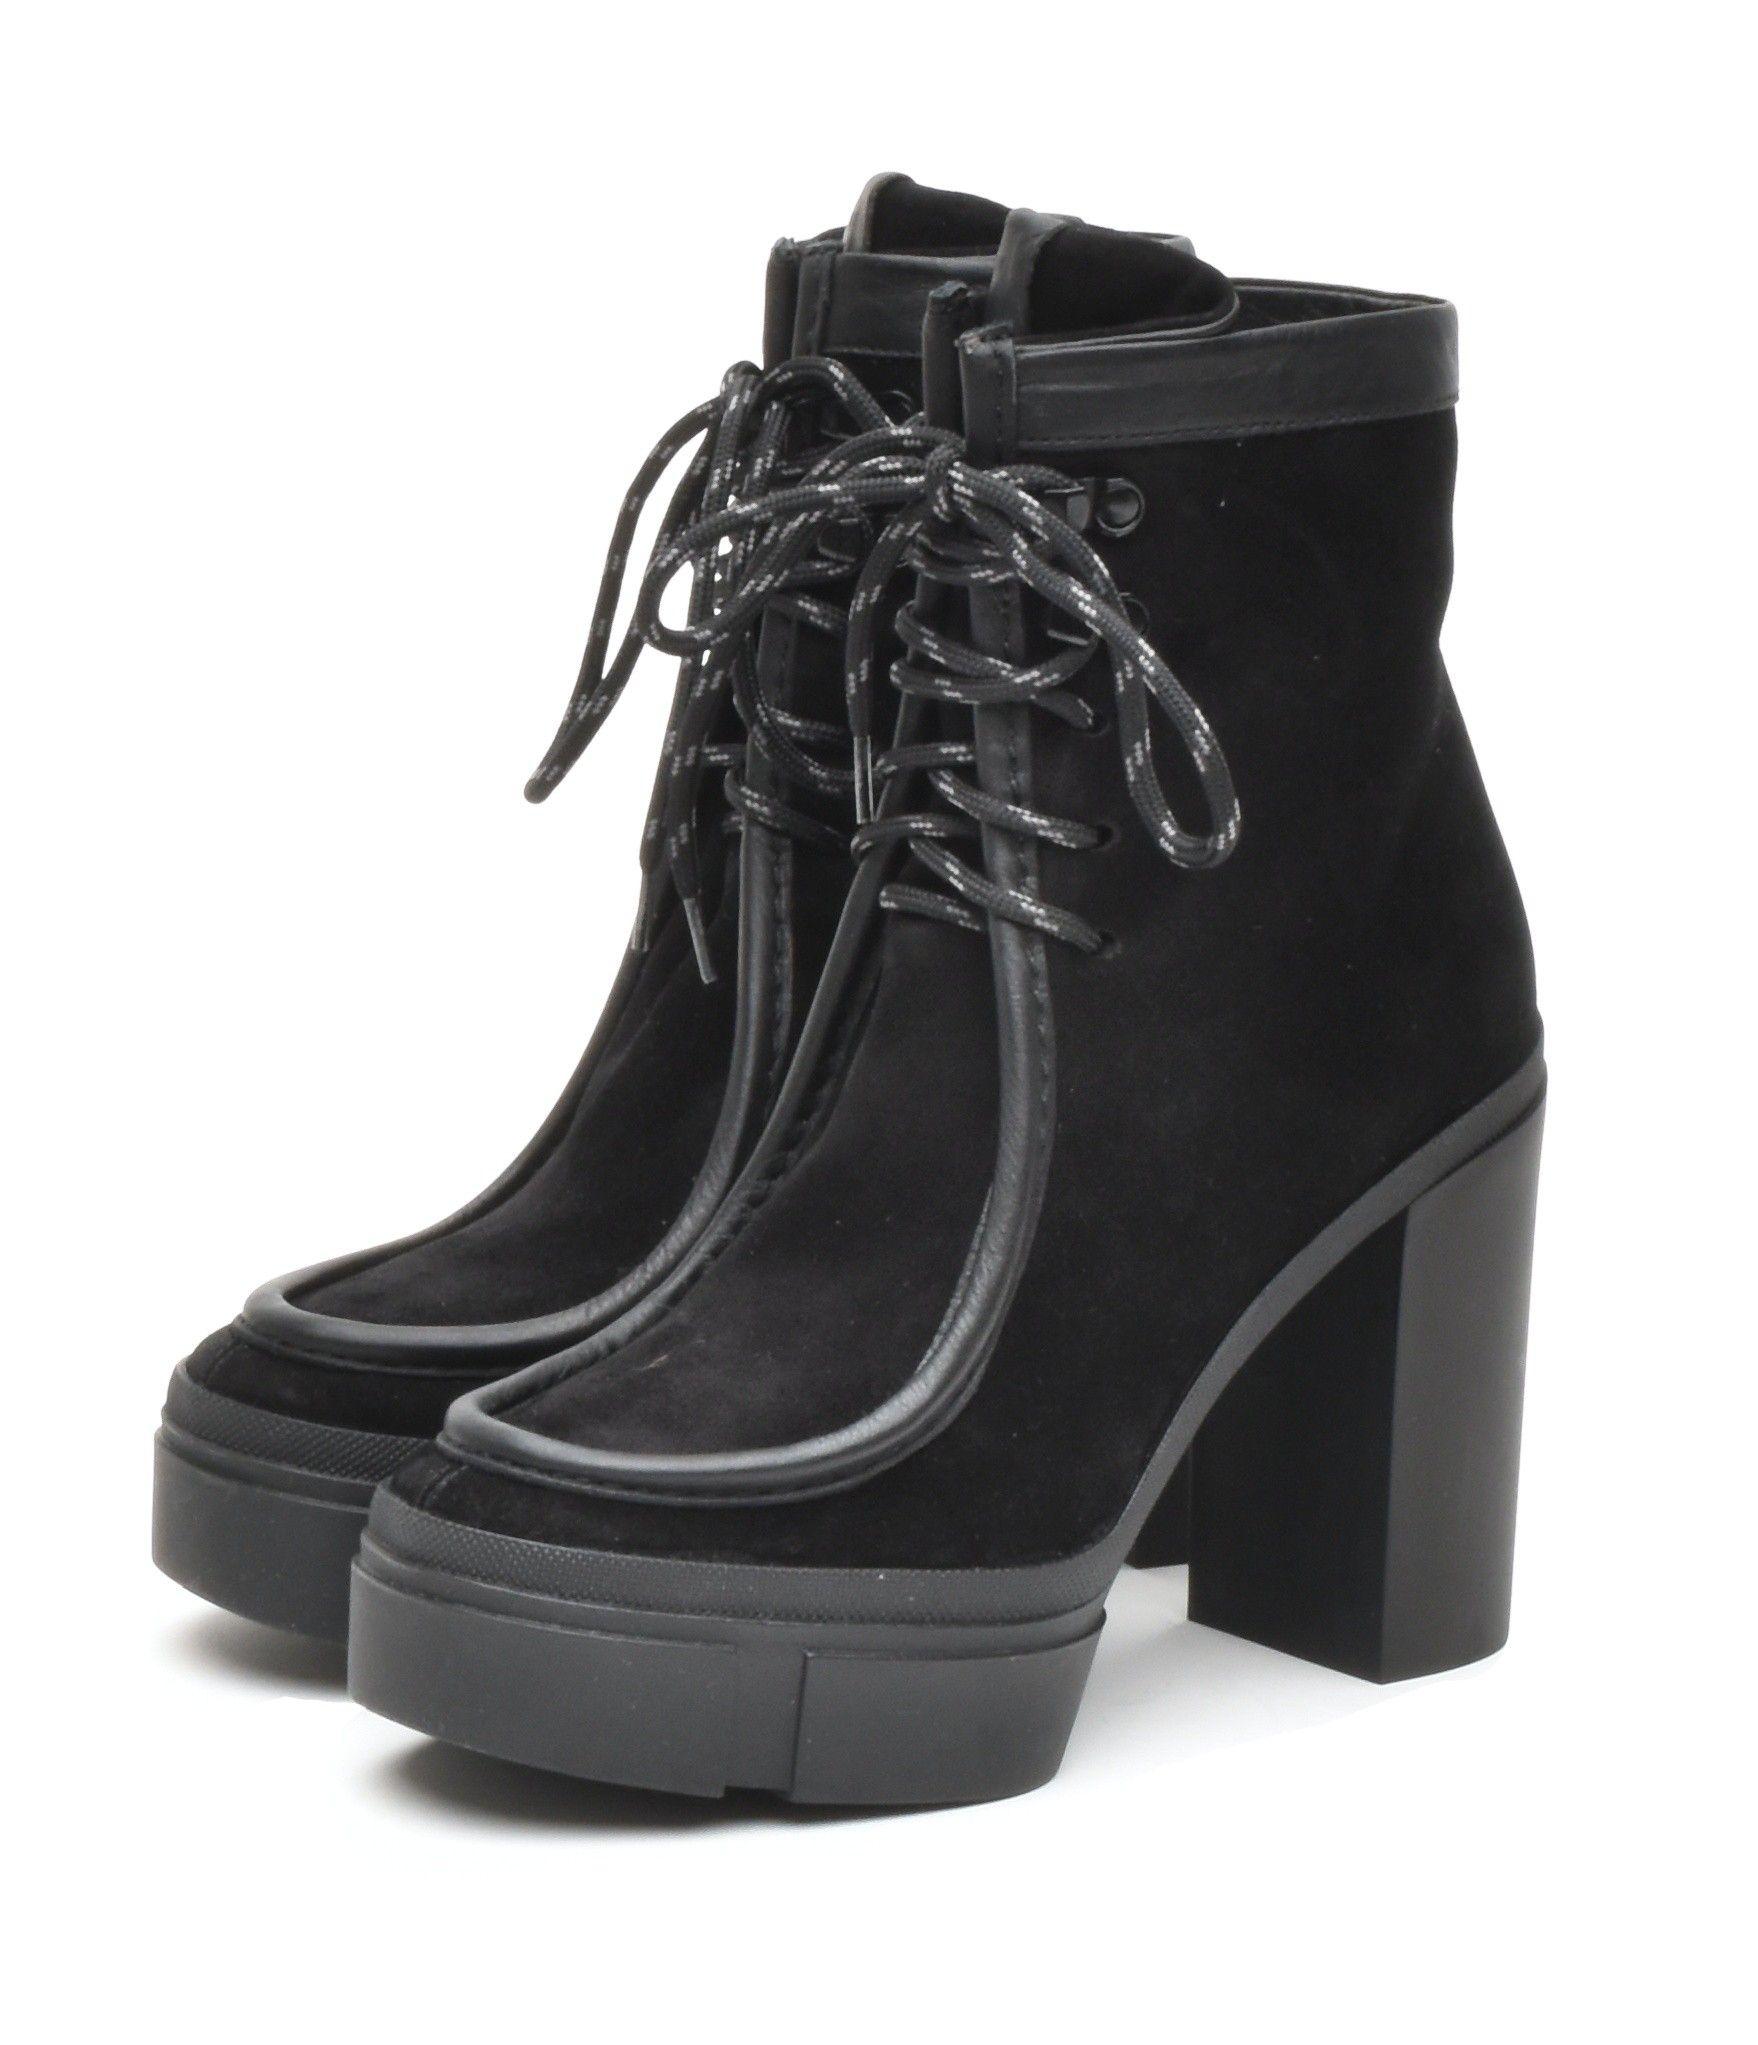 VIC MATIÈ - Damen Schuhe - Tronchetto Sensory Velvet - Black